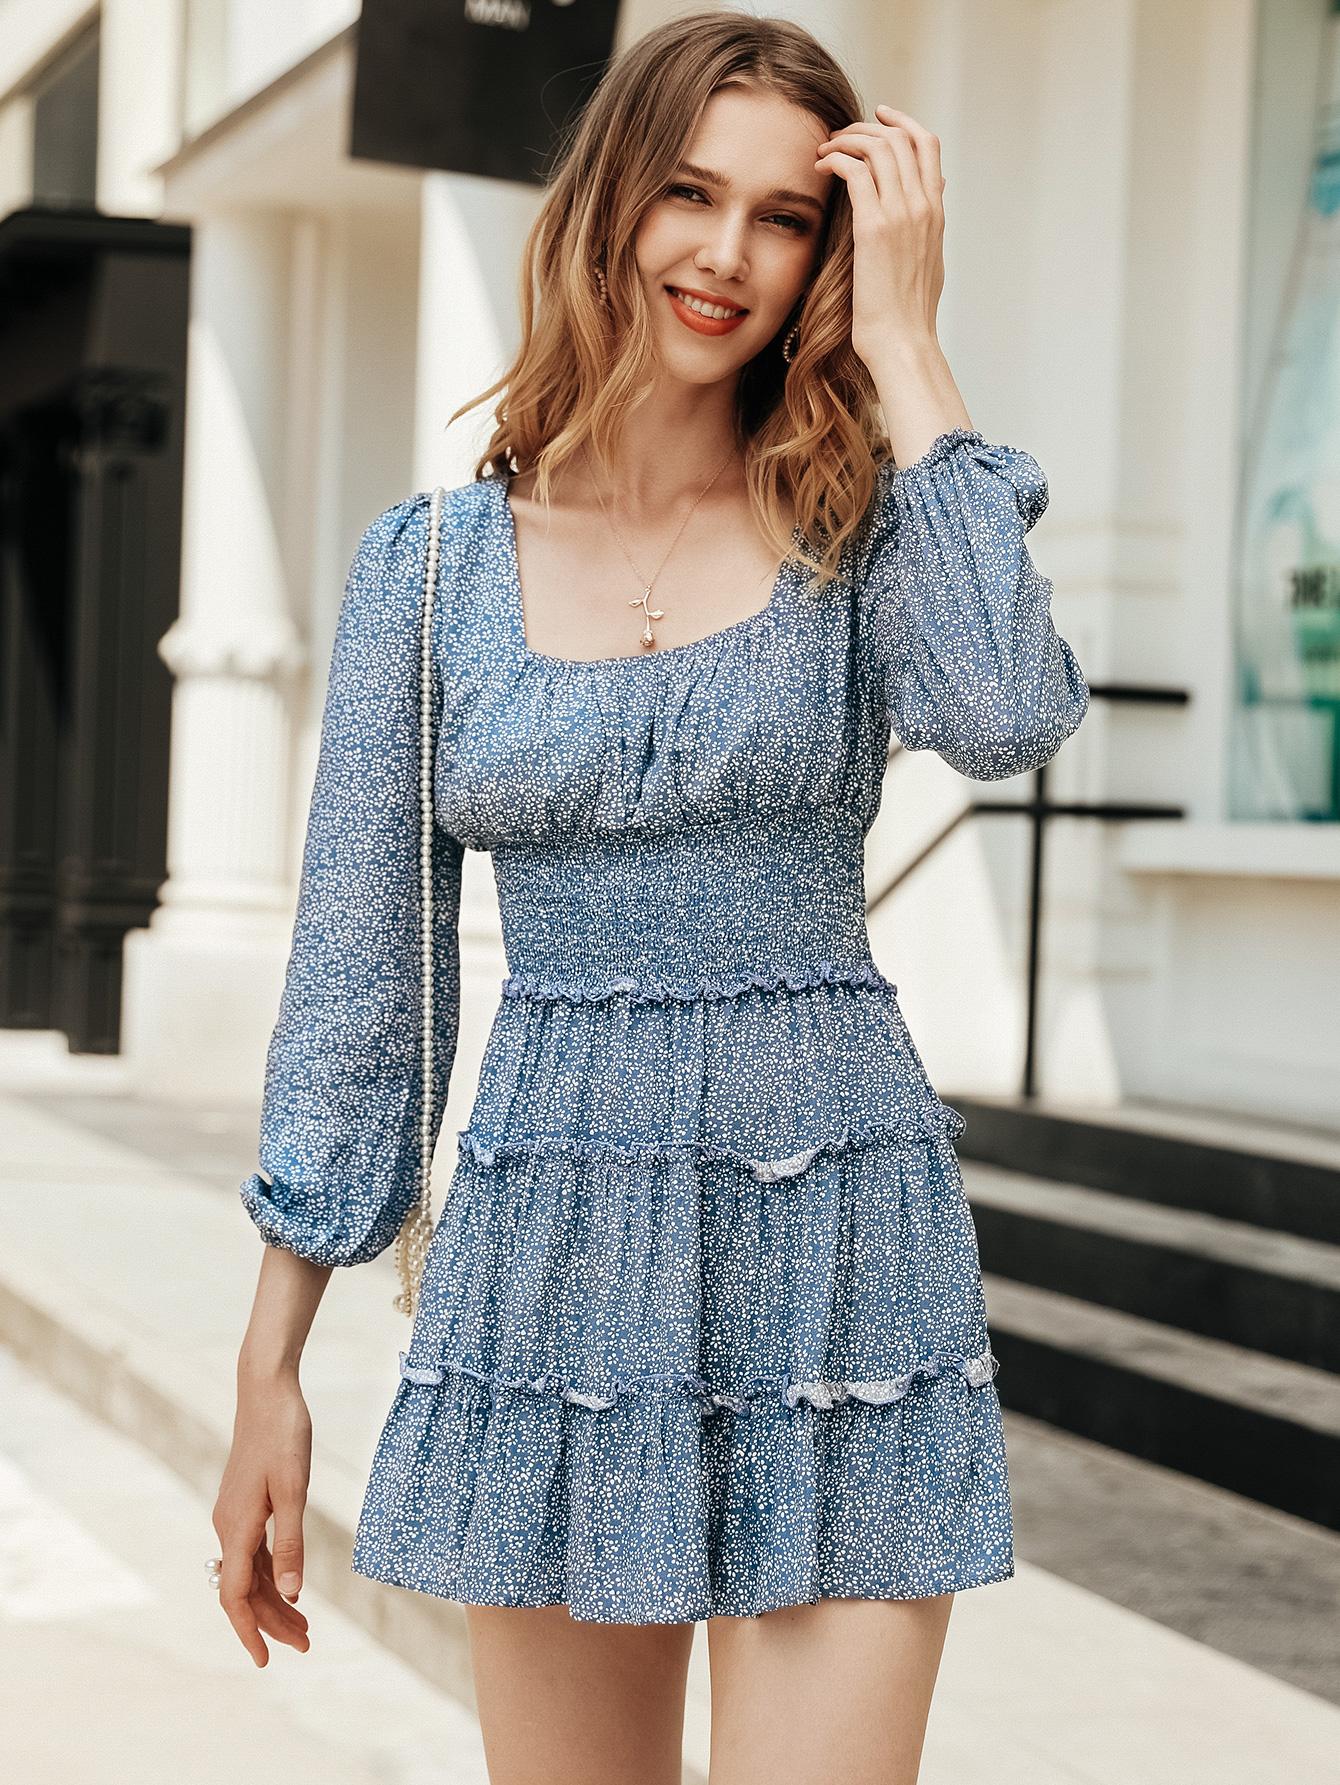 Sweet blue lace dress throughout women's fashion clothing NHDE195848